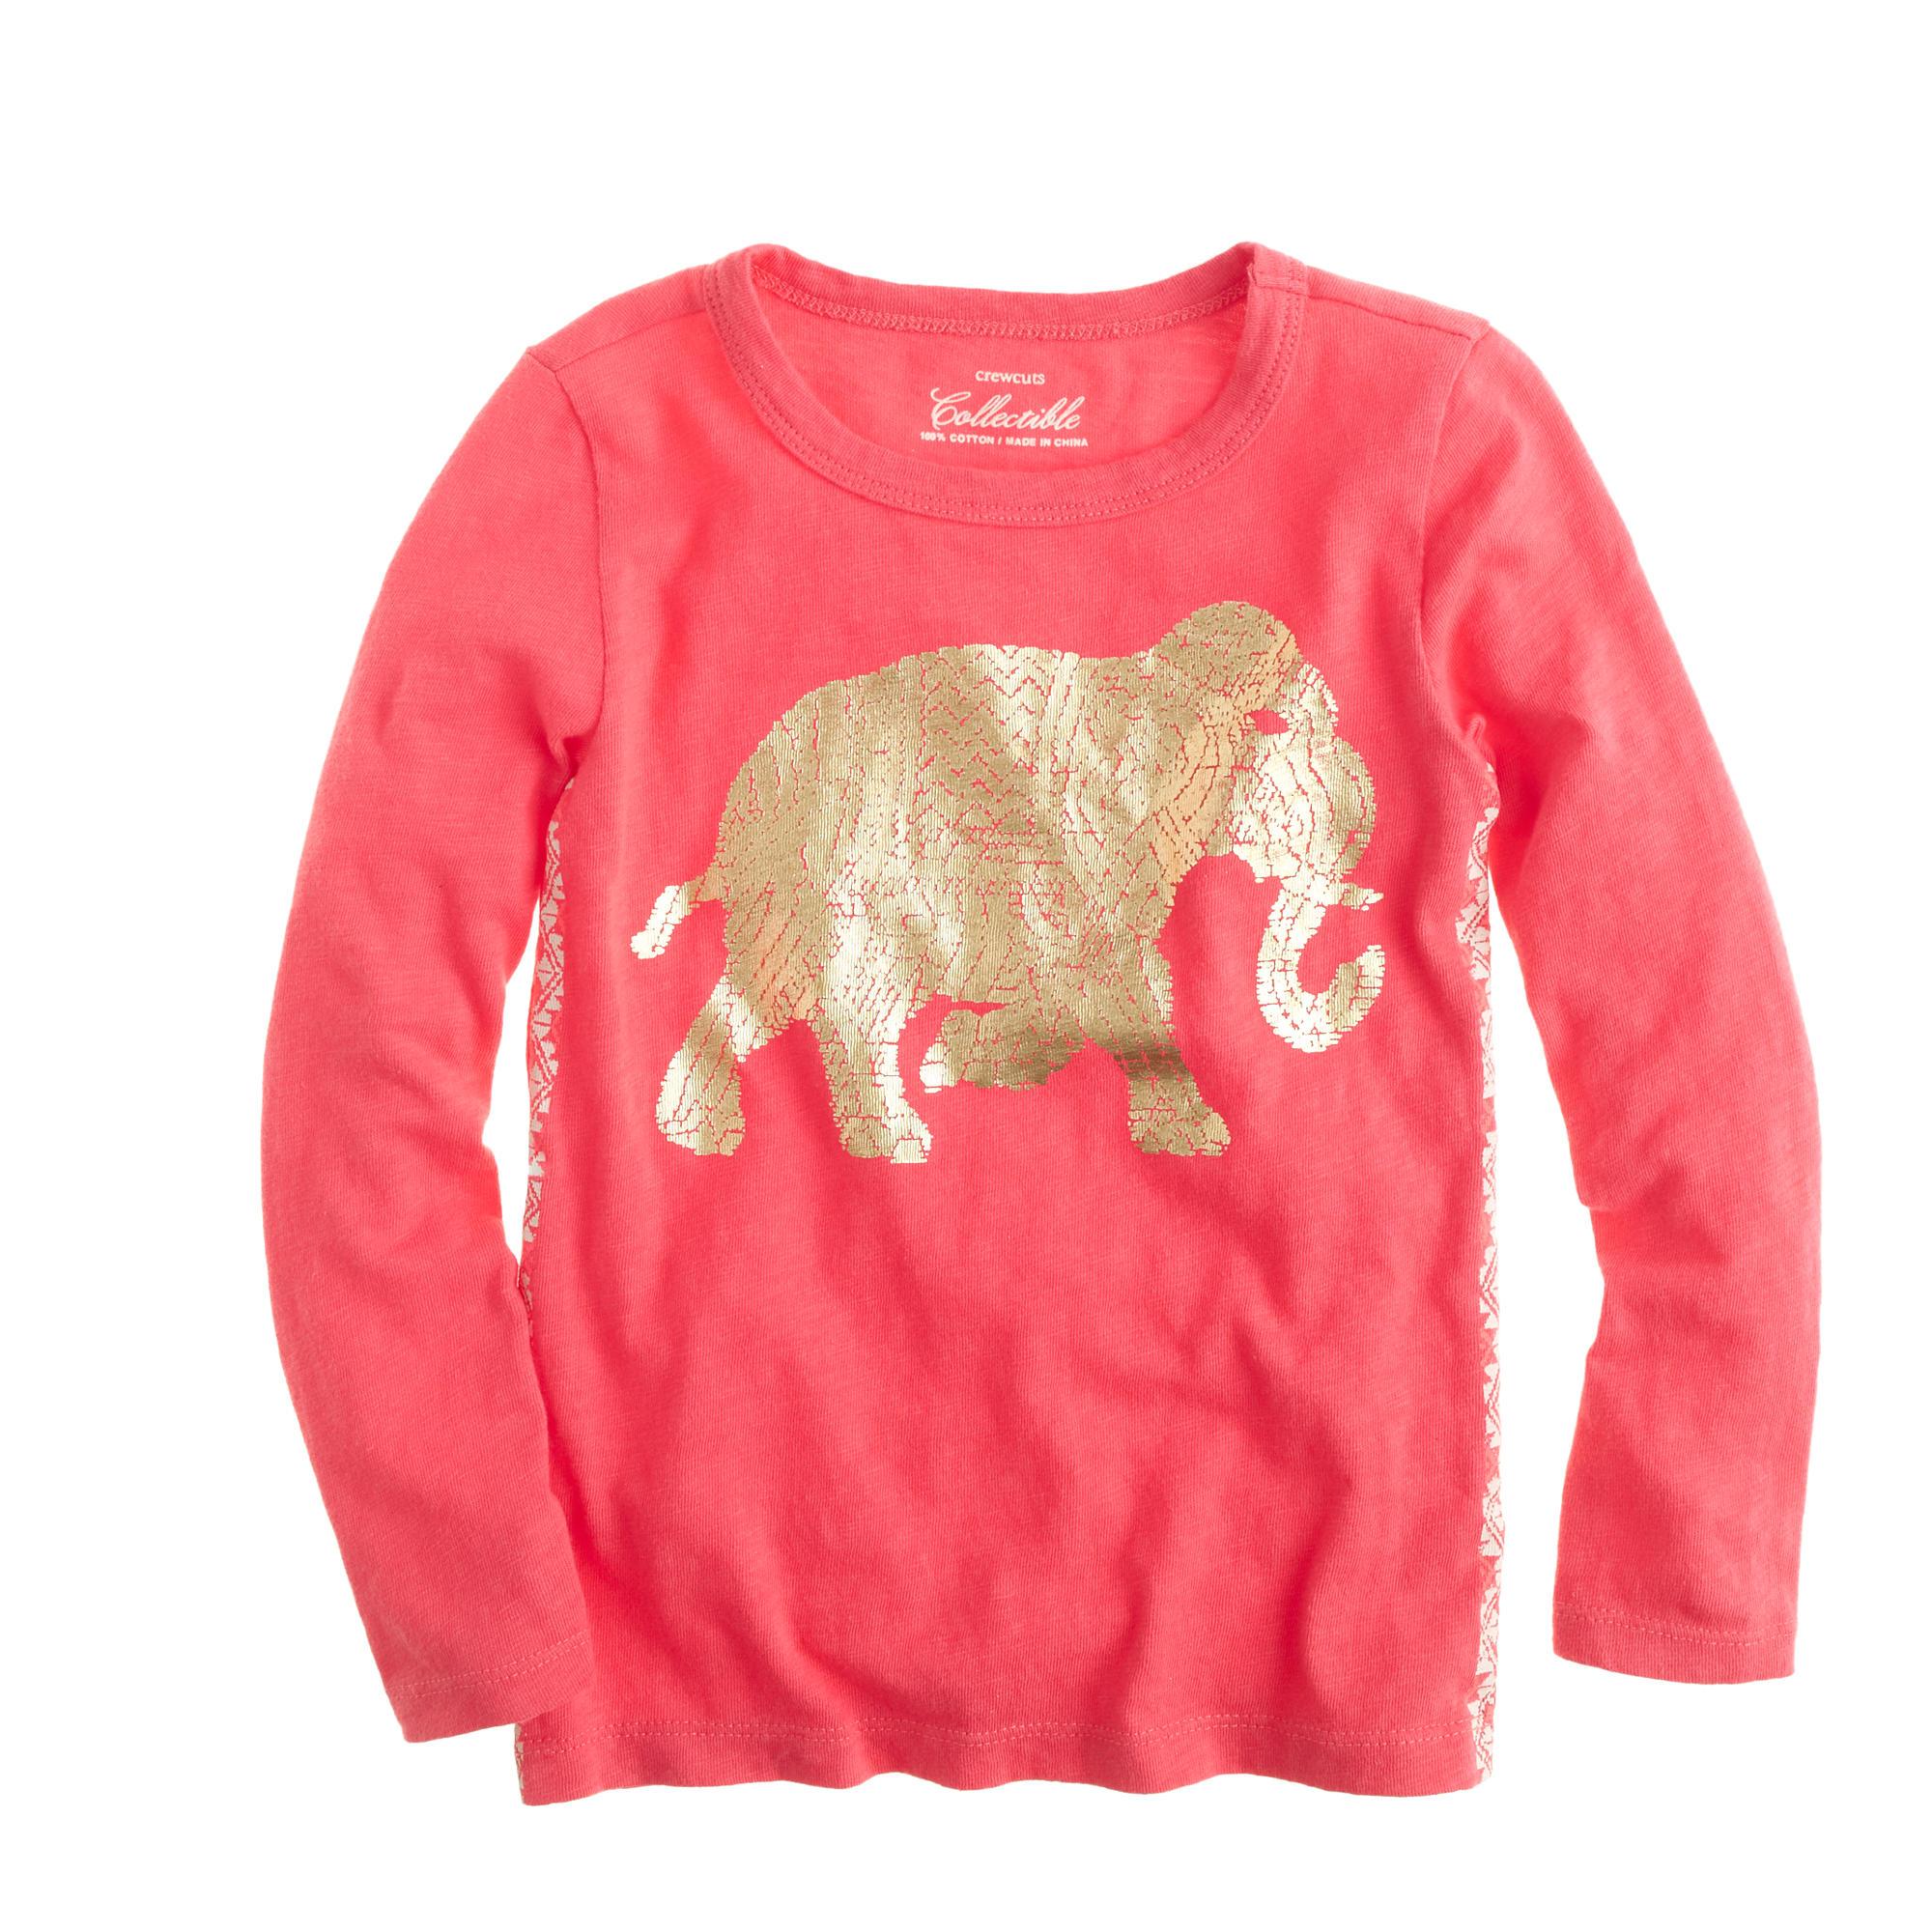 Girls 39 foil elephant t shirt j crew for Elephant t shirt women s